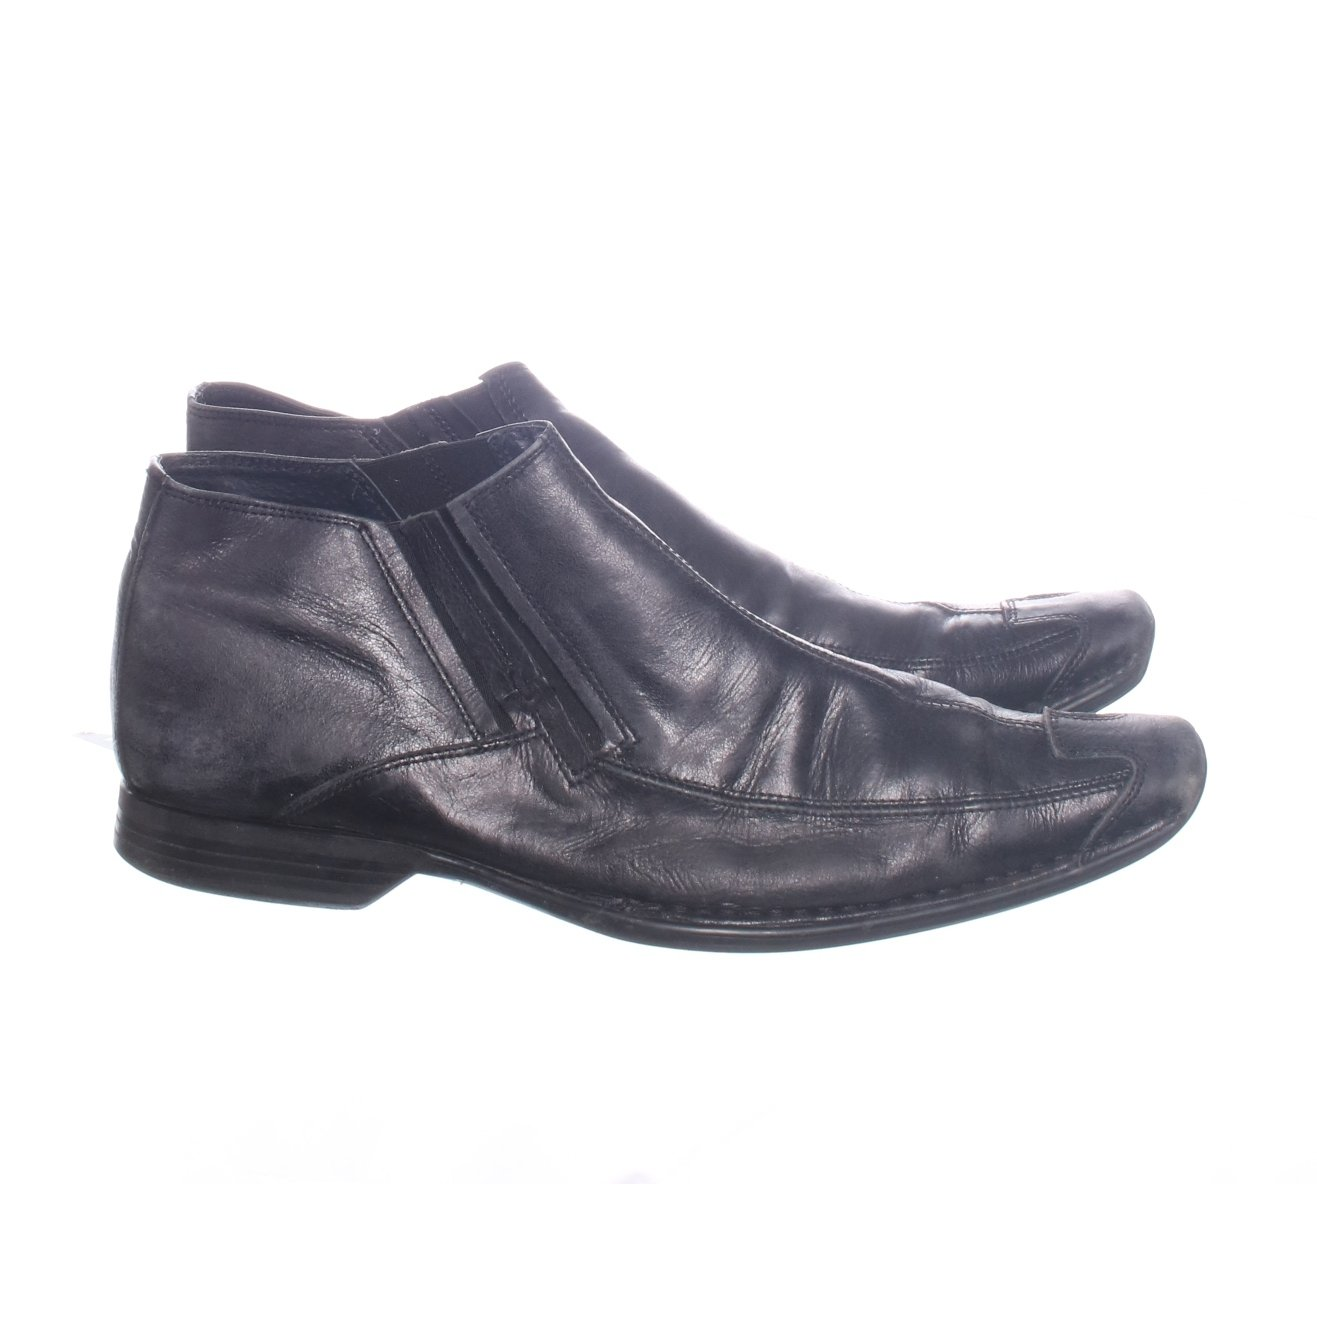 dc59102ab03 Bianco man, Boots, Strl: 44, Svart (346591116) ᐈ Sellpy på Tradera